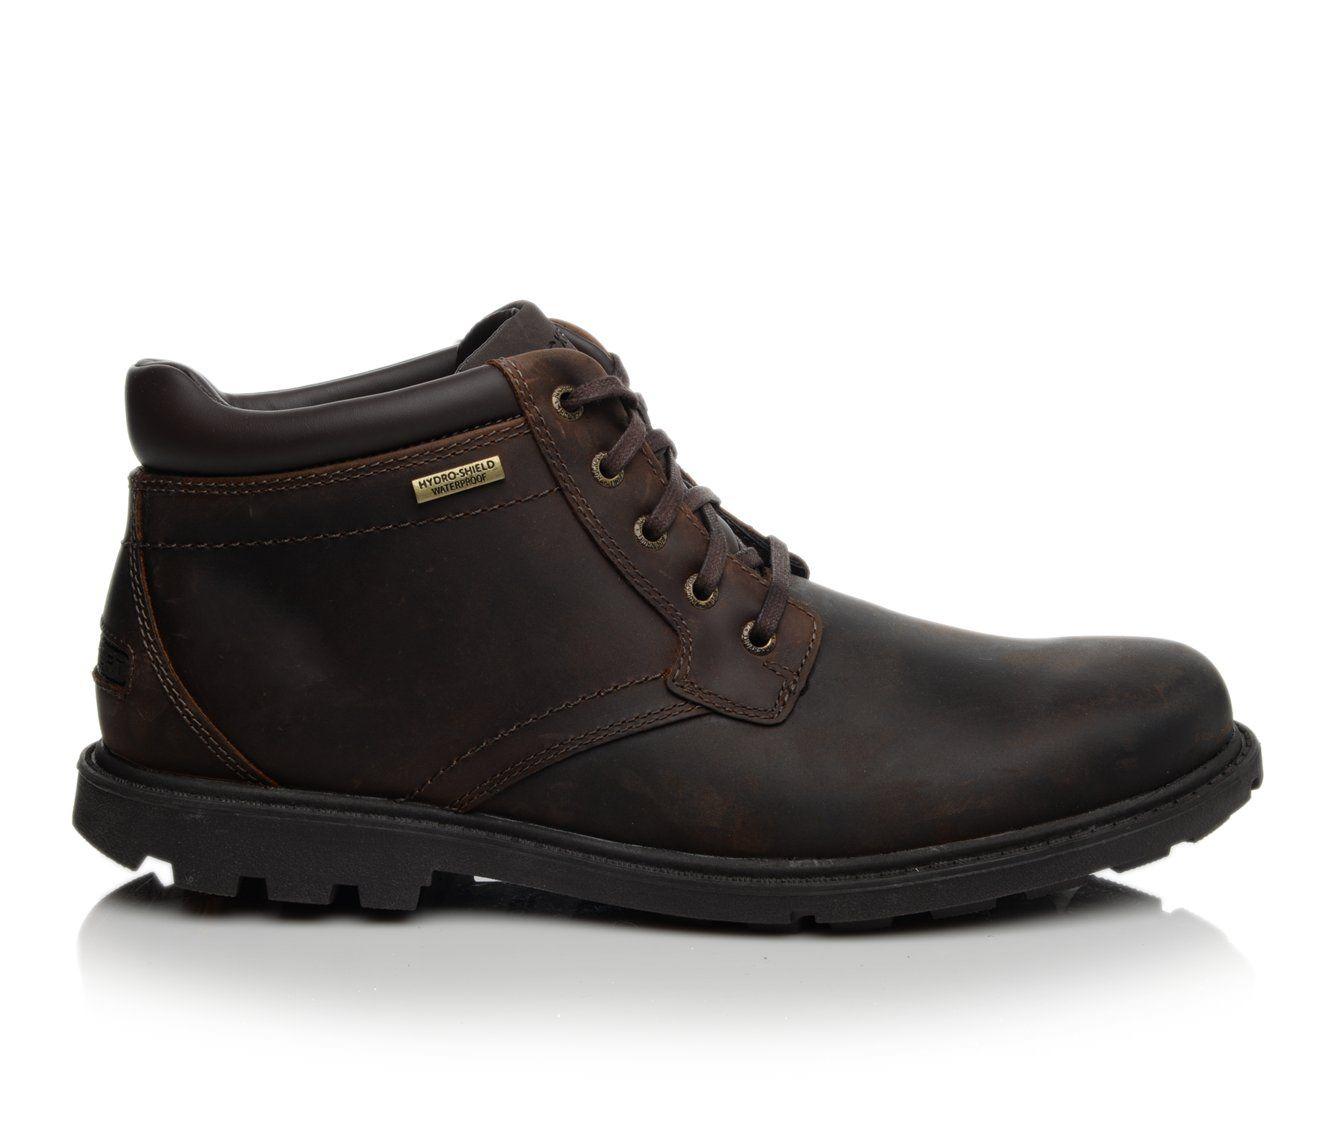 Rockport Storm Surge Men's Boots (Brown Leather)